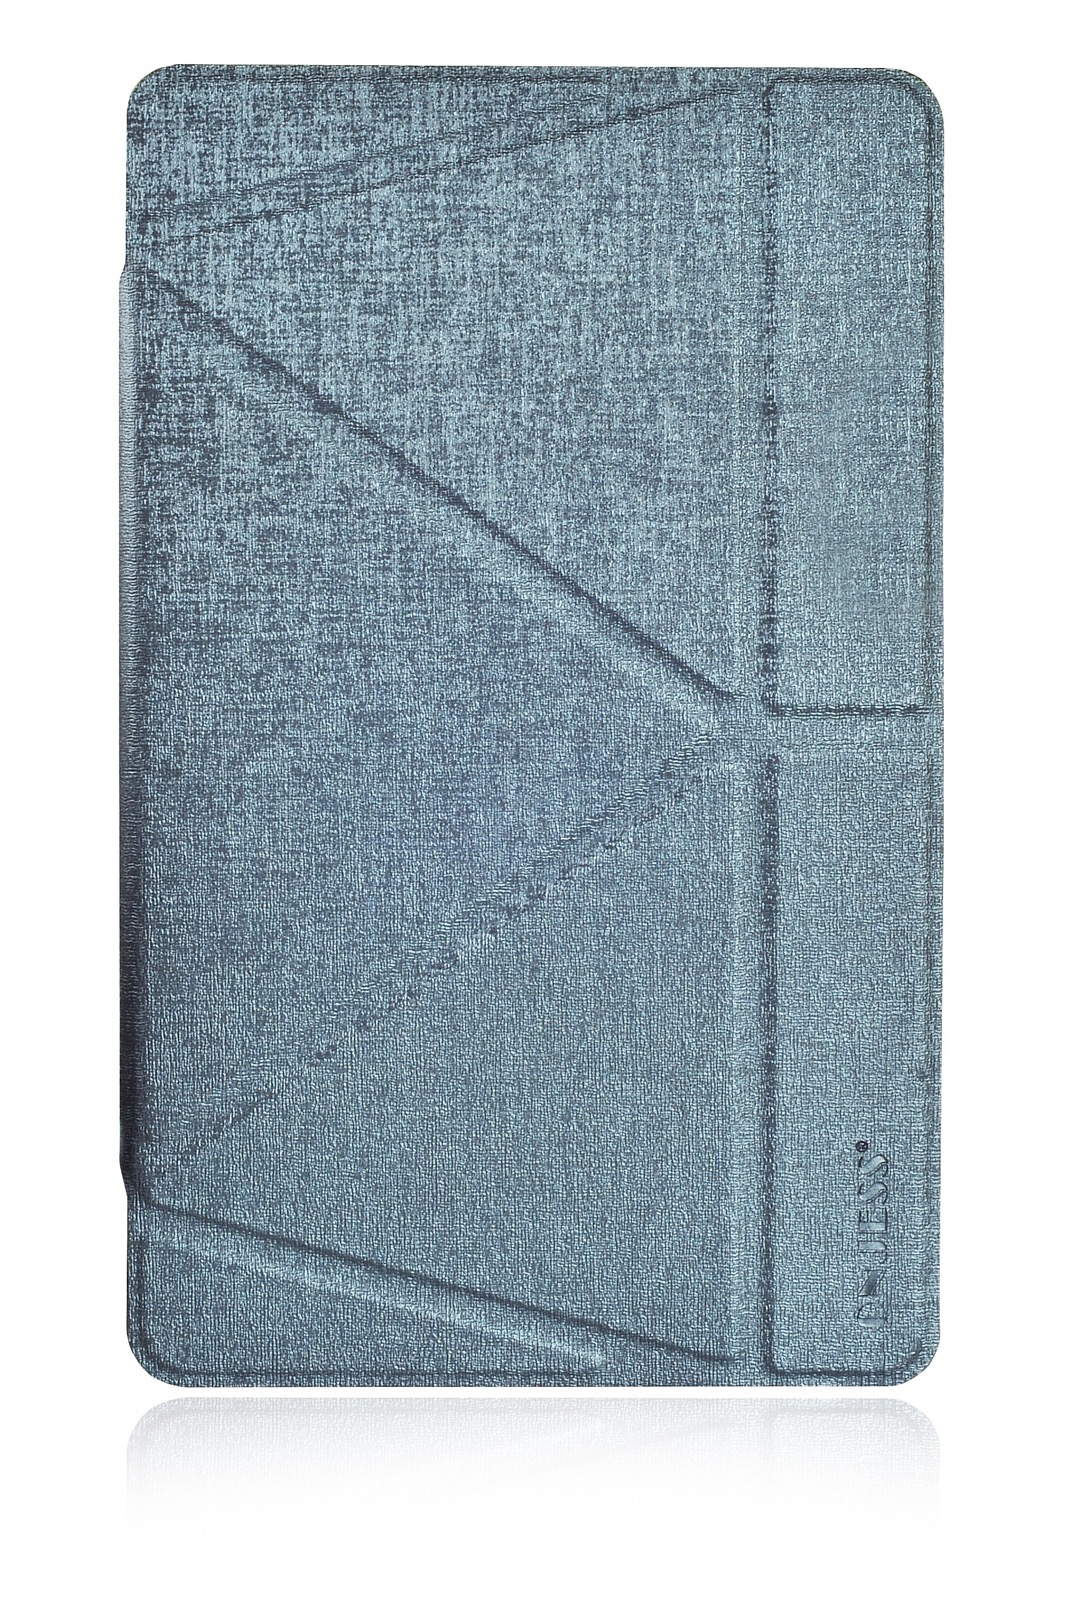 Чехол для планшета Onjess Smart для Samsung Tab S4 10.5 T835, 908031, серый аксессуар чехол onjess для samsung tab s4 10 5 t835 smart grey 908031